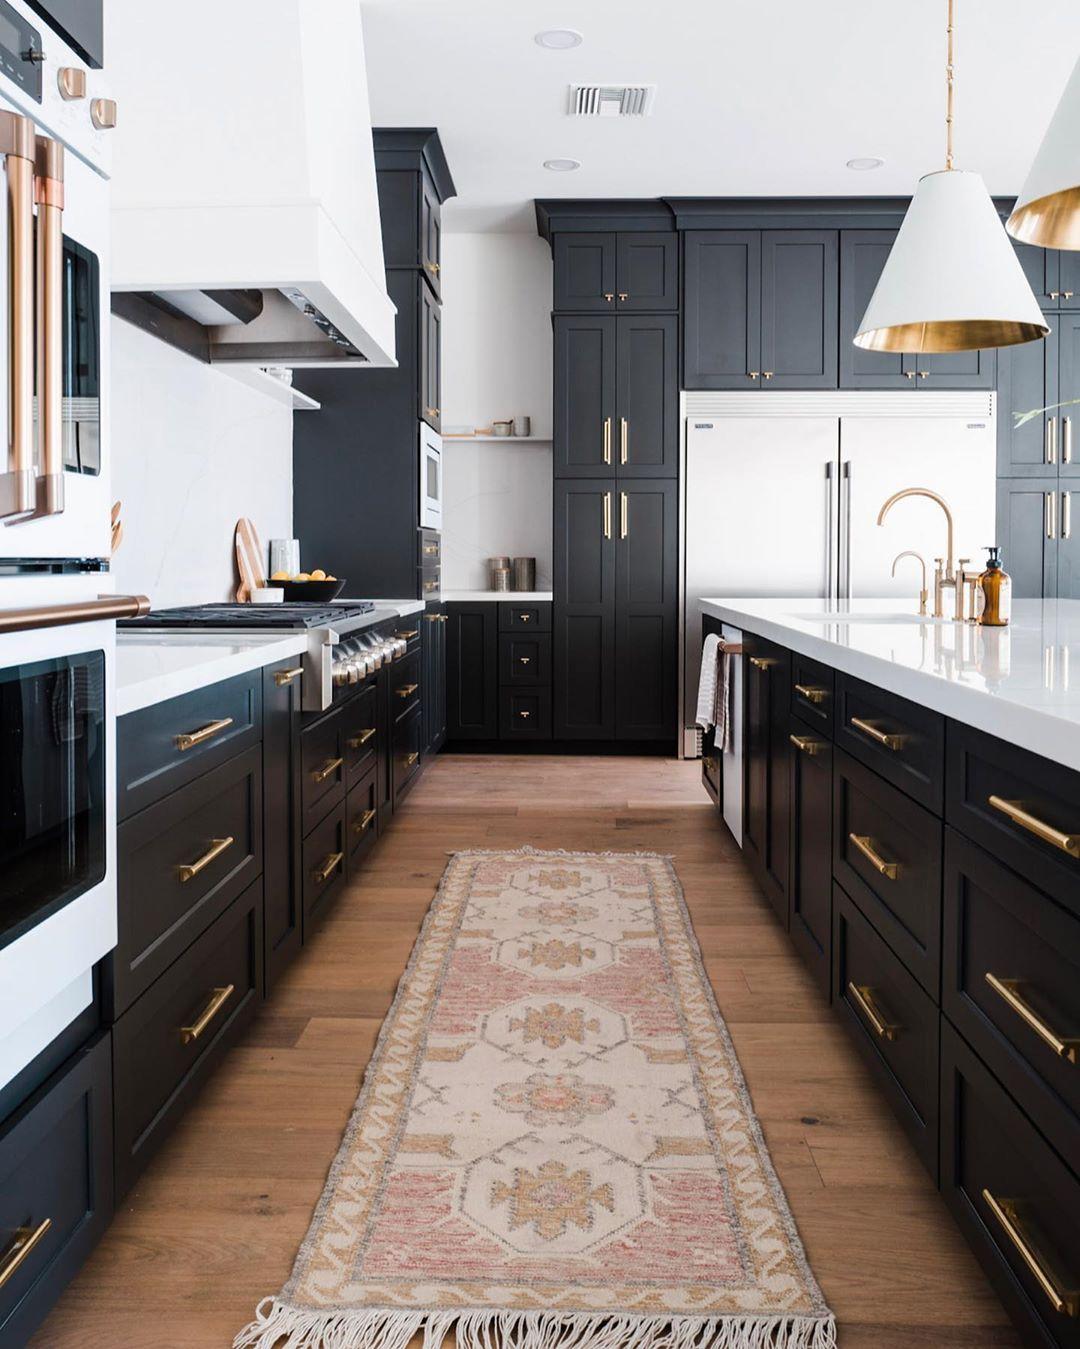 1 377 Likes 55 Comments E Interiors Design Studio Einteriors Design On Instagram In 2020 Kitchen Remodel Kitchen Inspirations Interior Decorating Inspiration